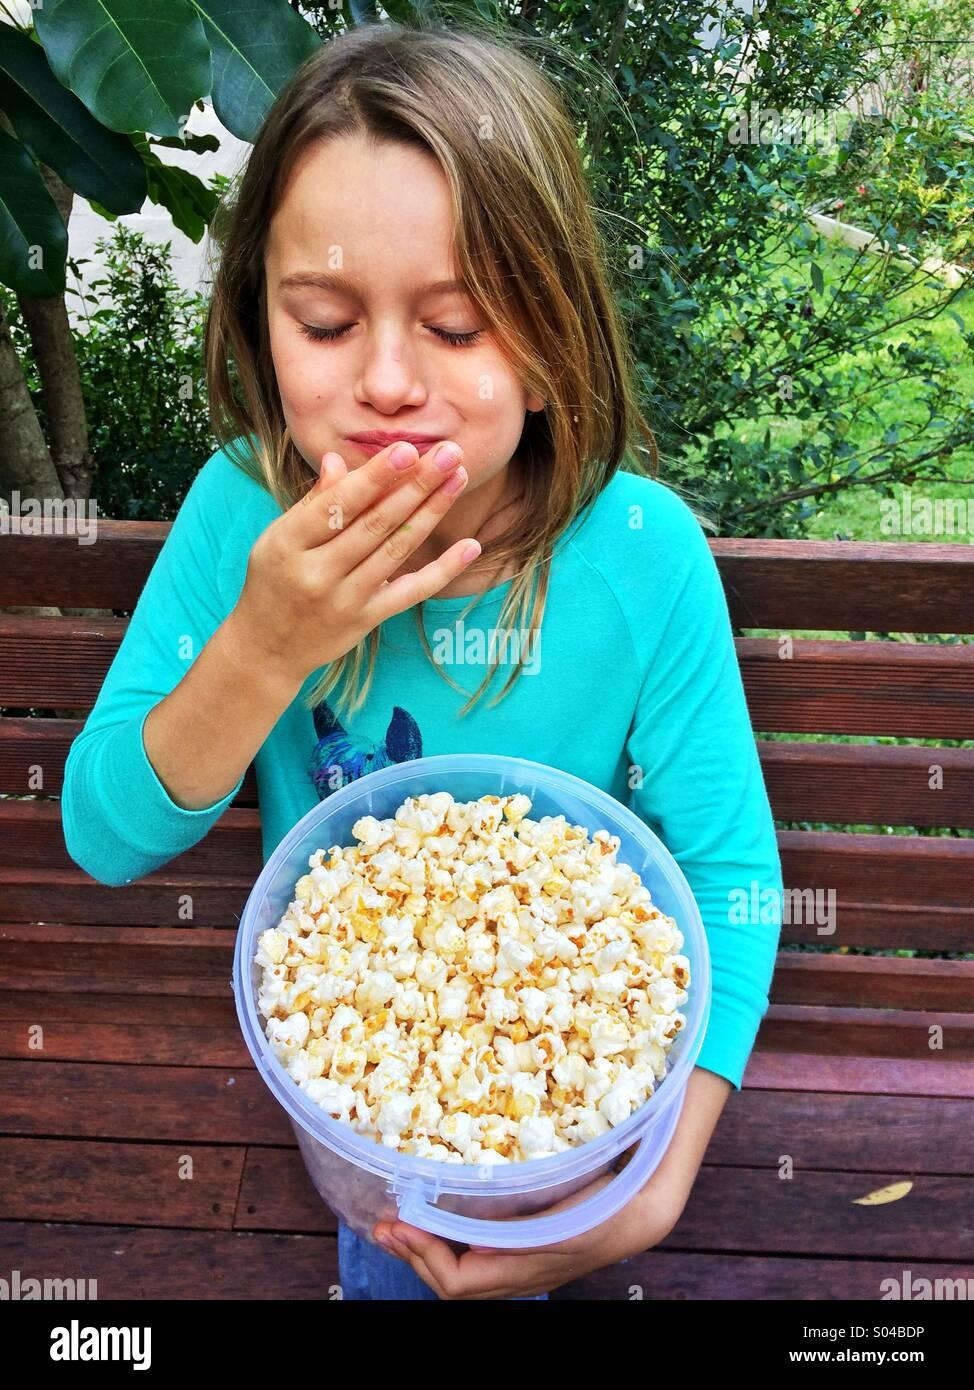 Muchacha comiendo palomitas Foto de stock